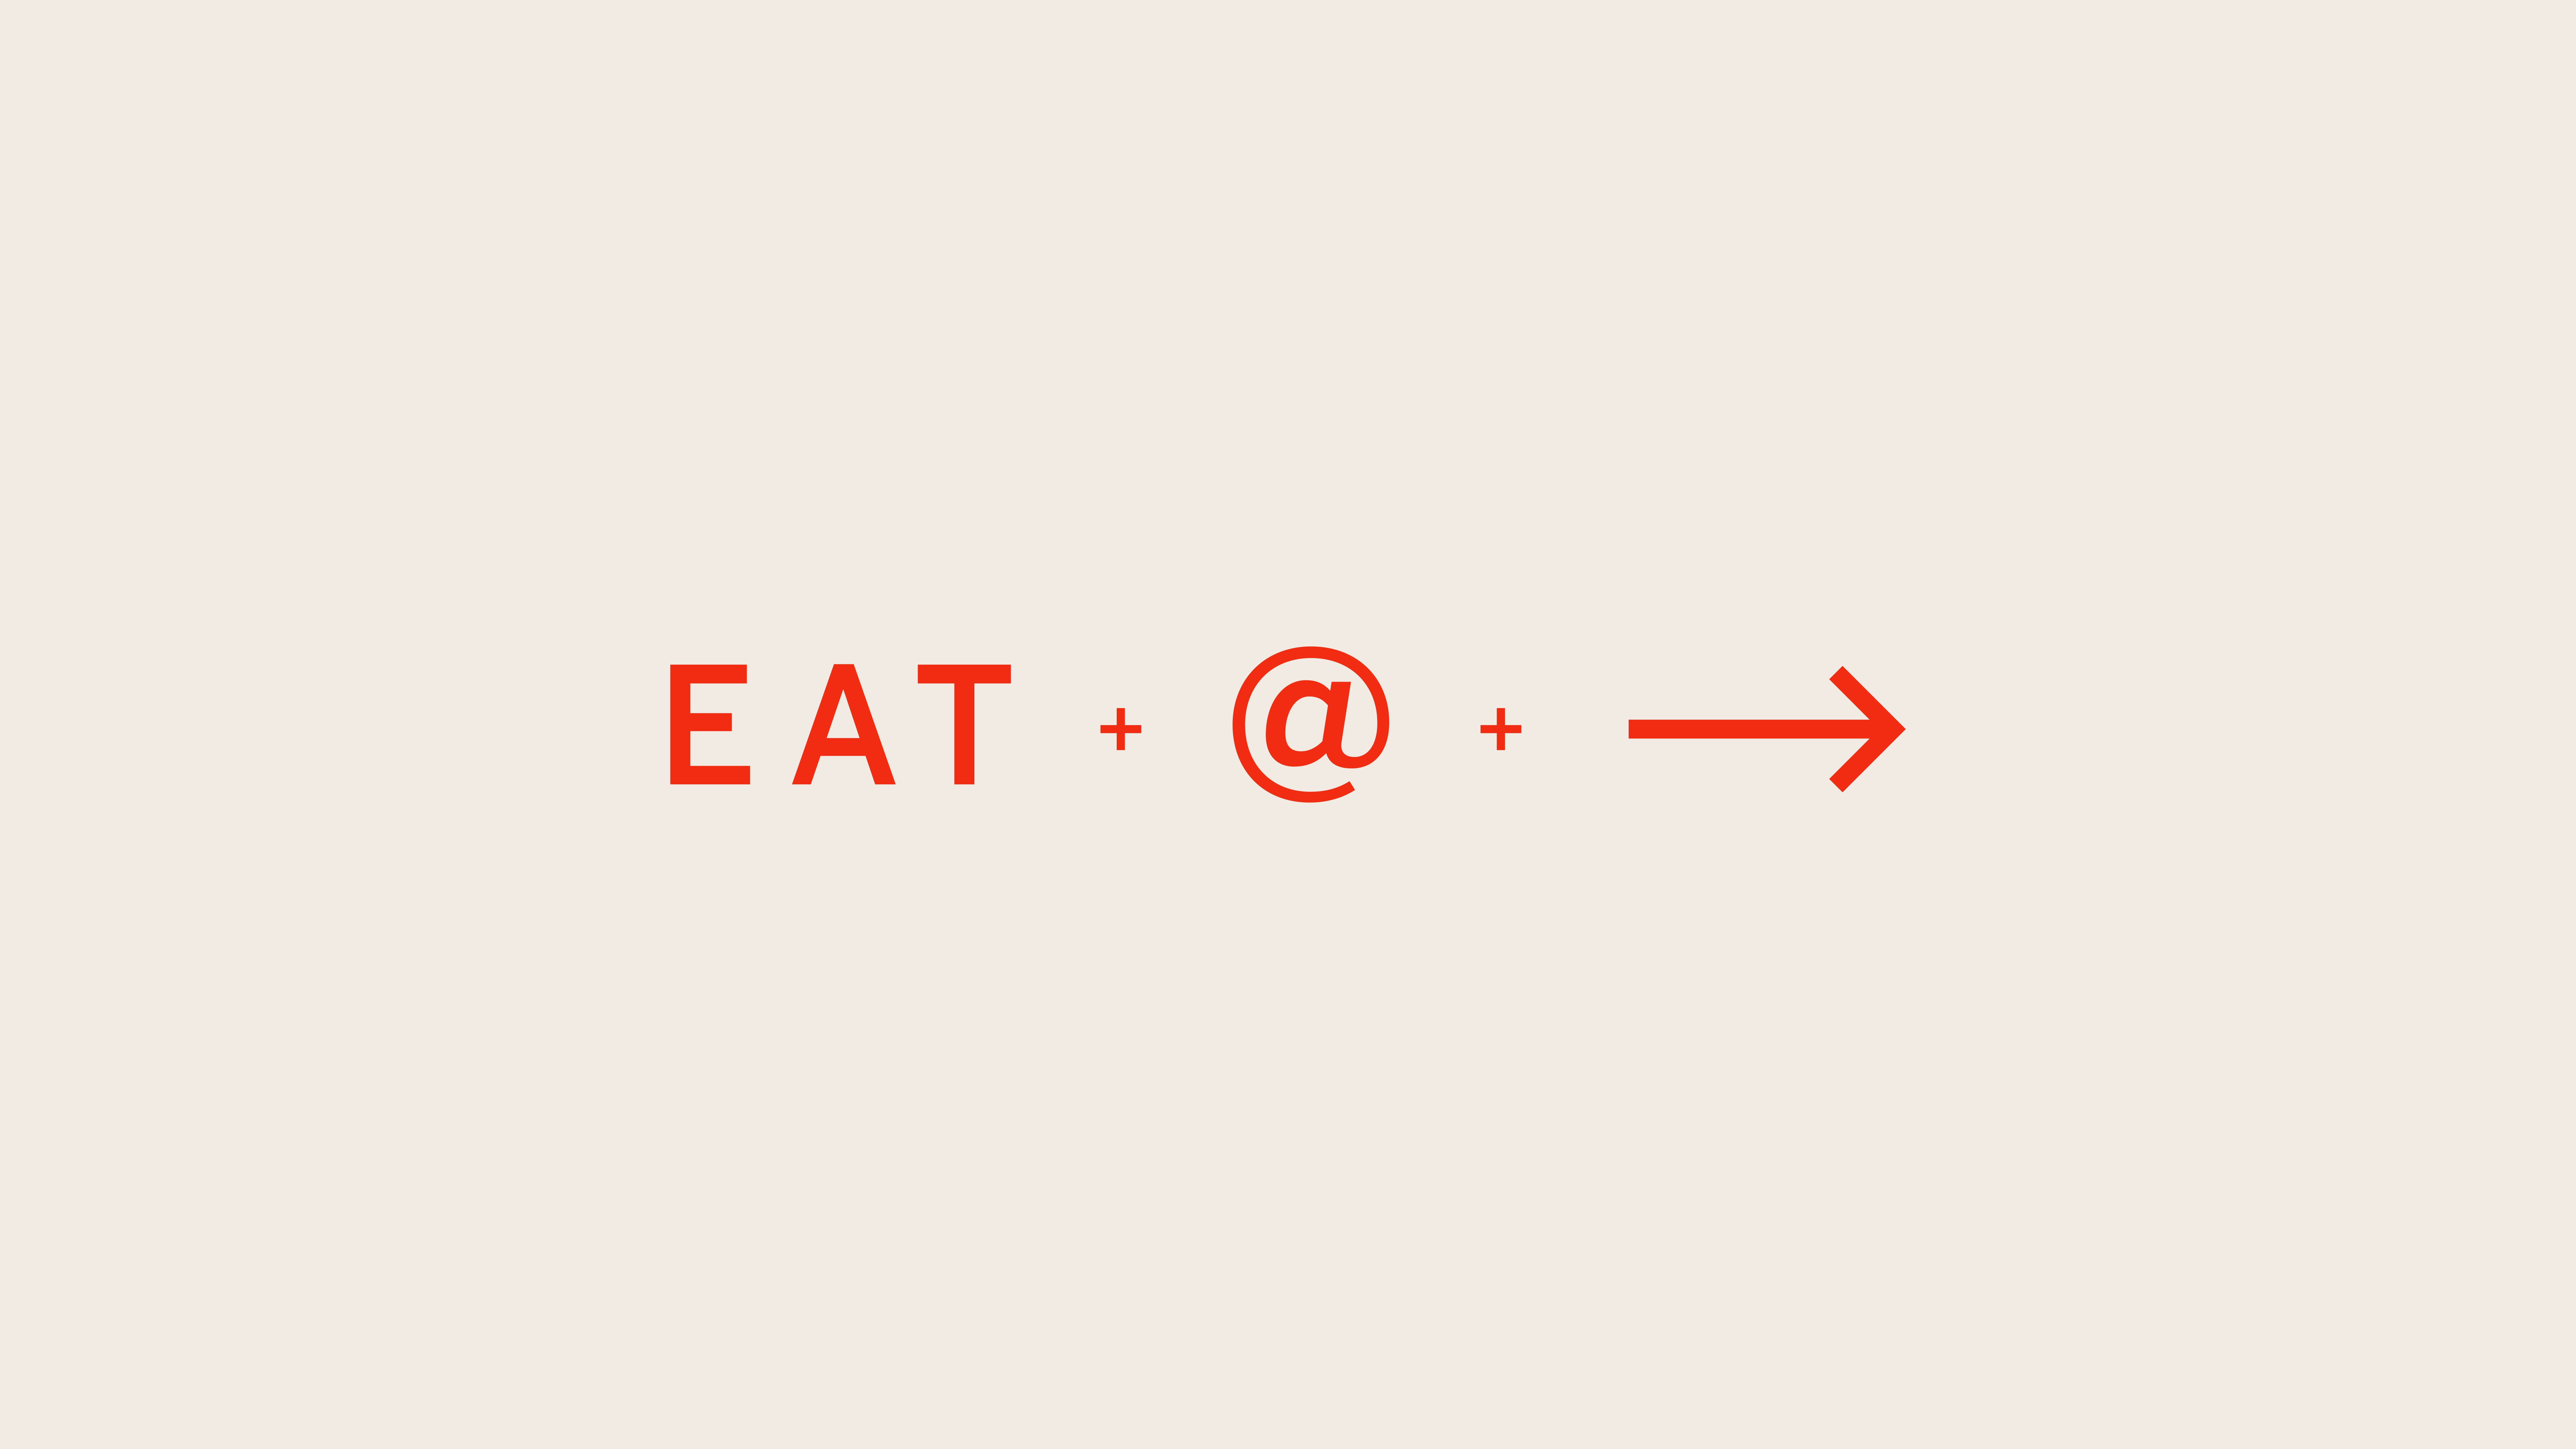 Eatthissf idea large